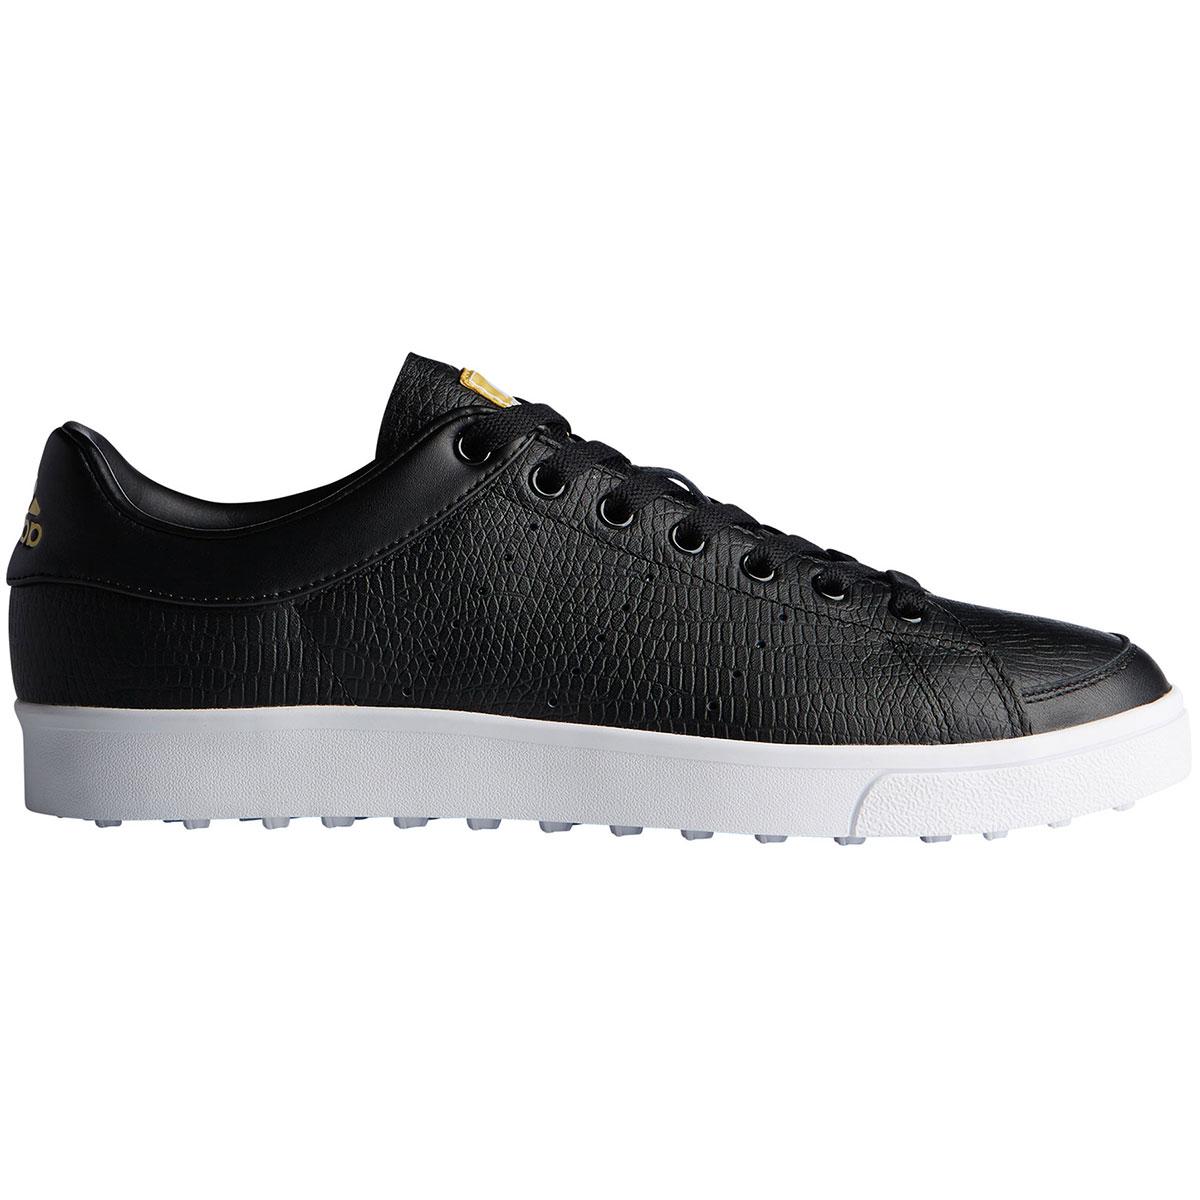 Adidas Golf Adicross Classic Leather Shoes Online Golf